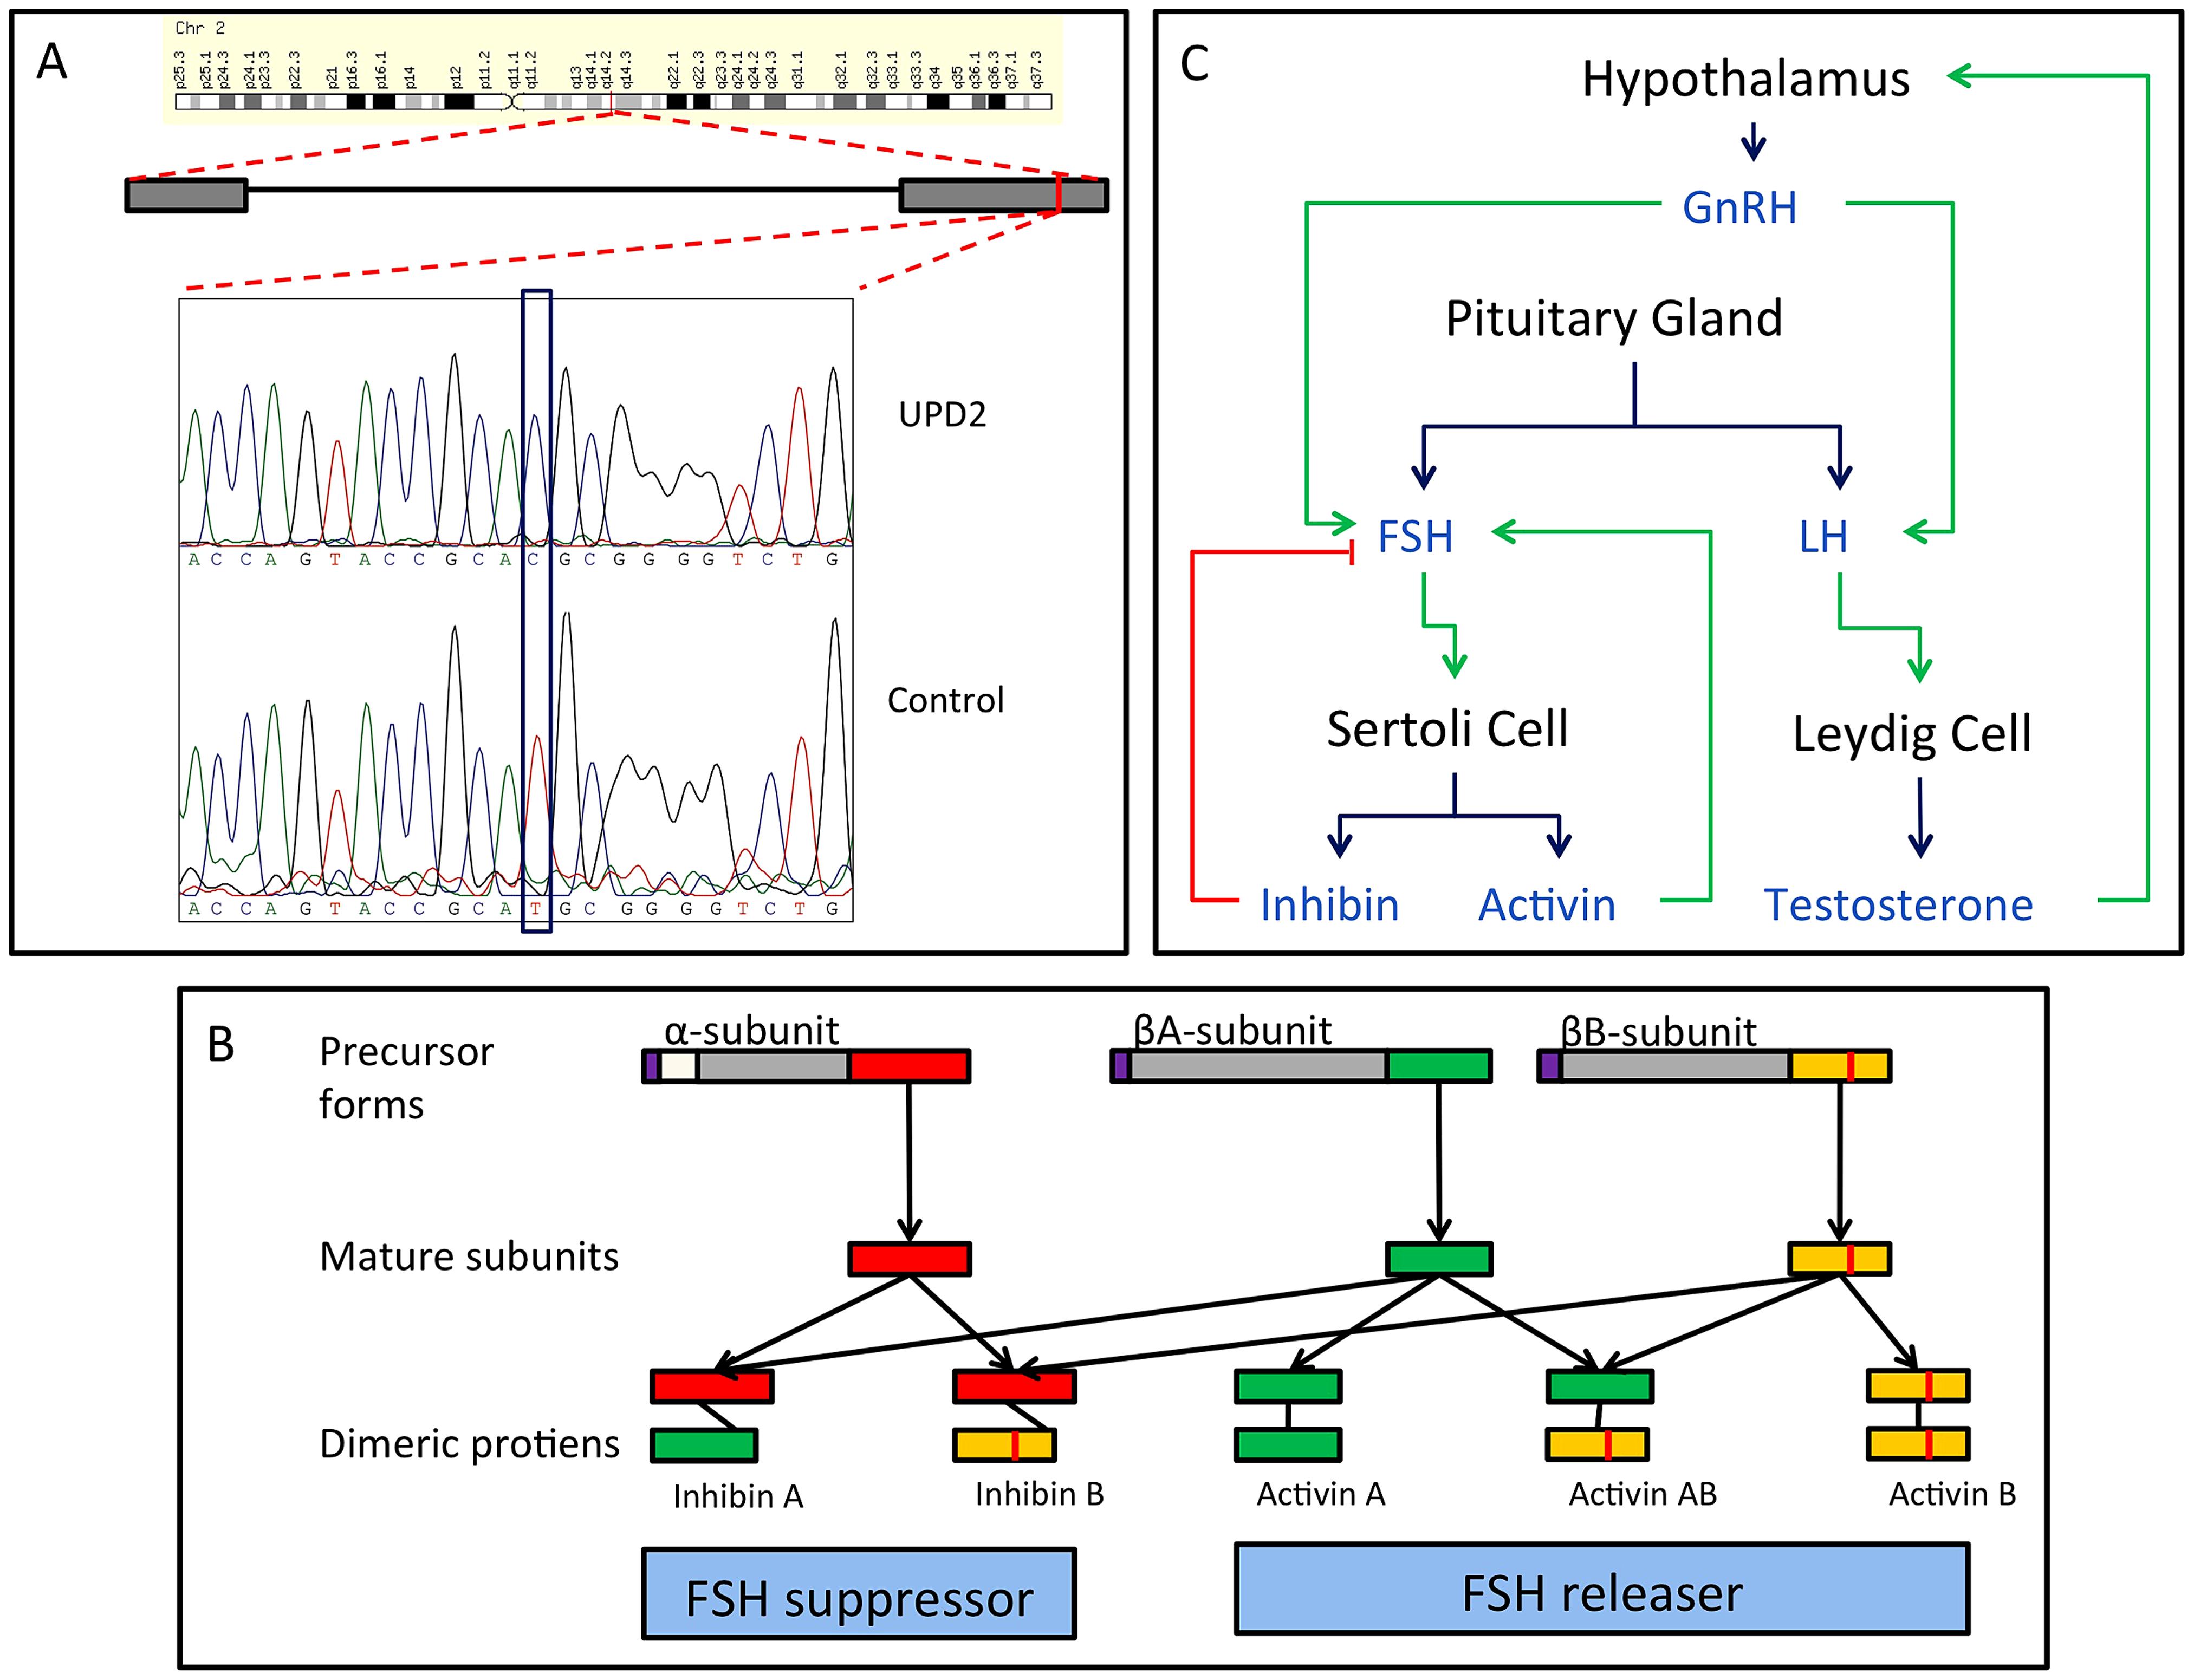 Homozygous missense mutation of <i>INHBB</i> identified in the case of UPD2.